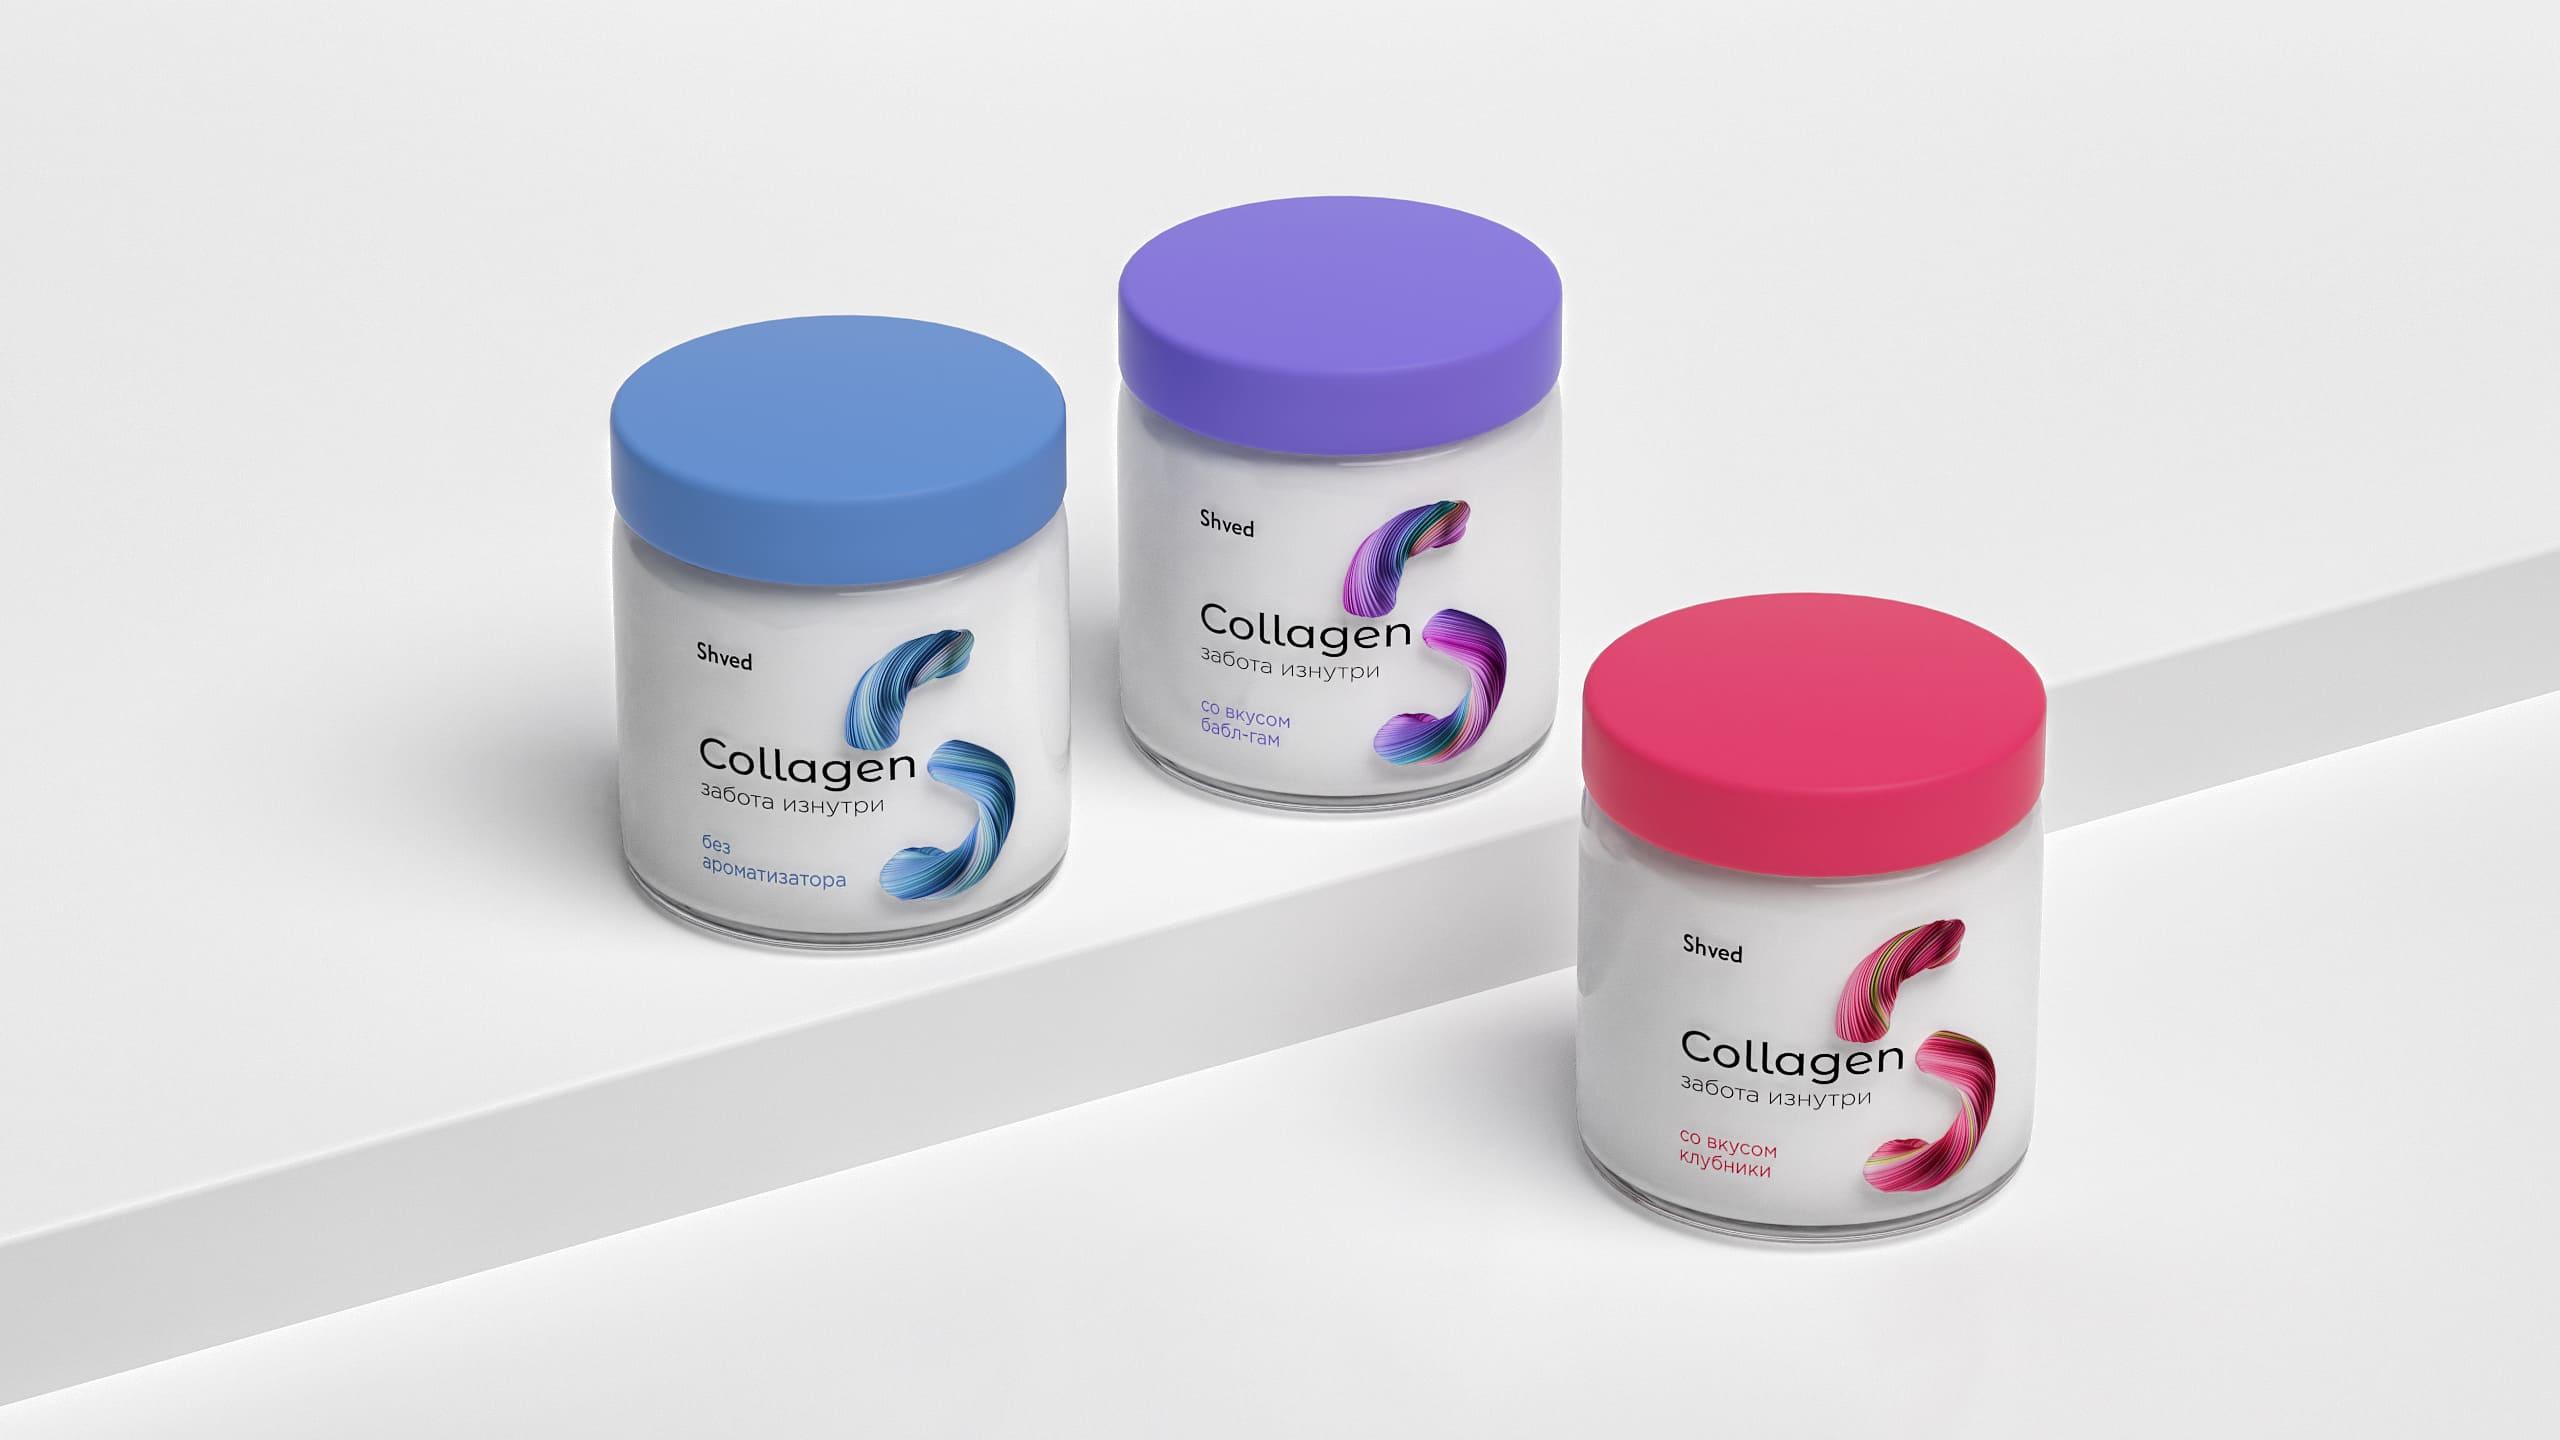 Zuper Agency Create Packaging Design for the Shved Collagen